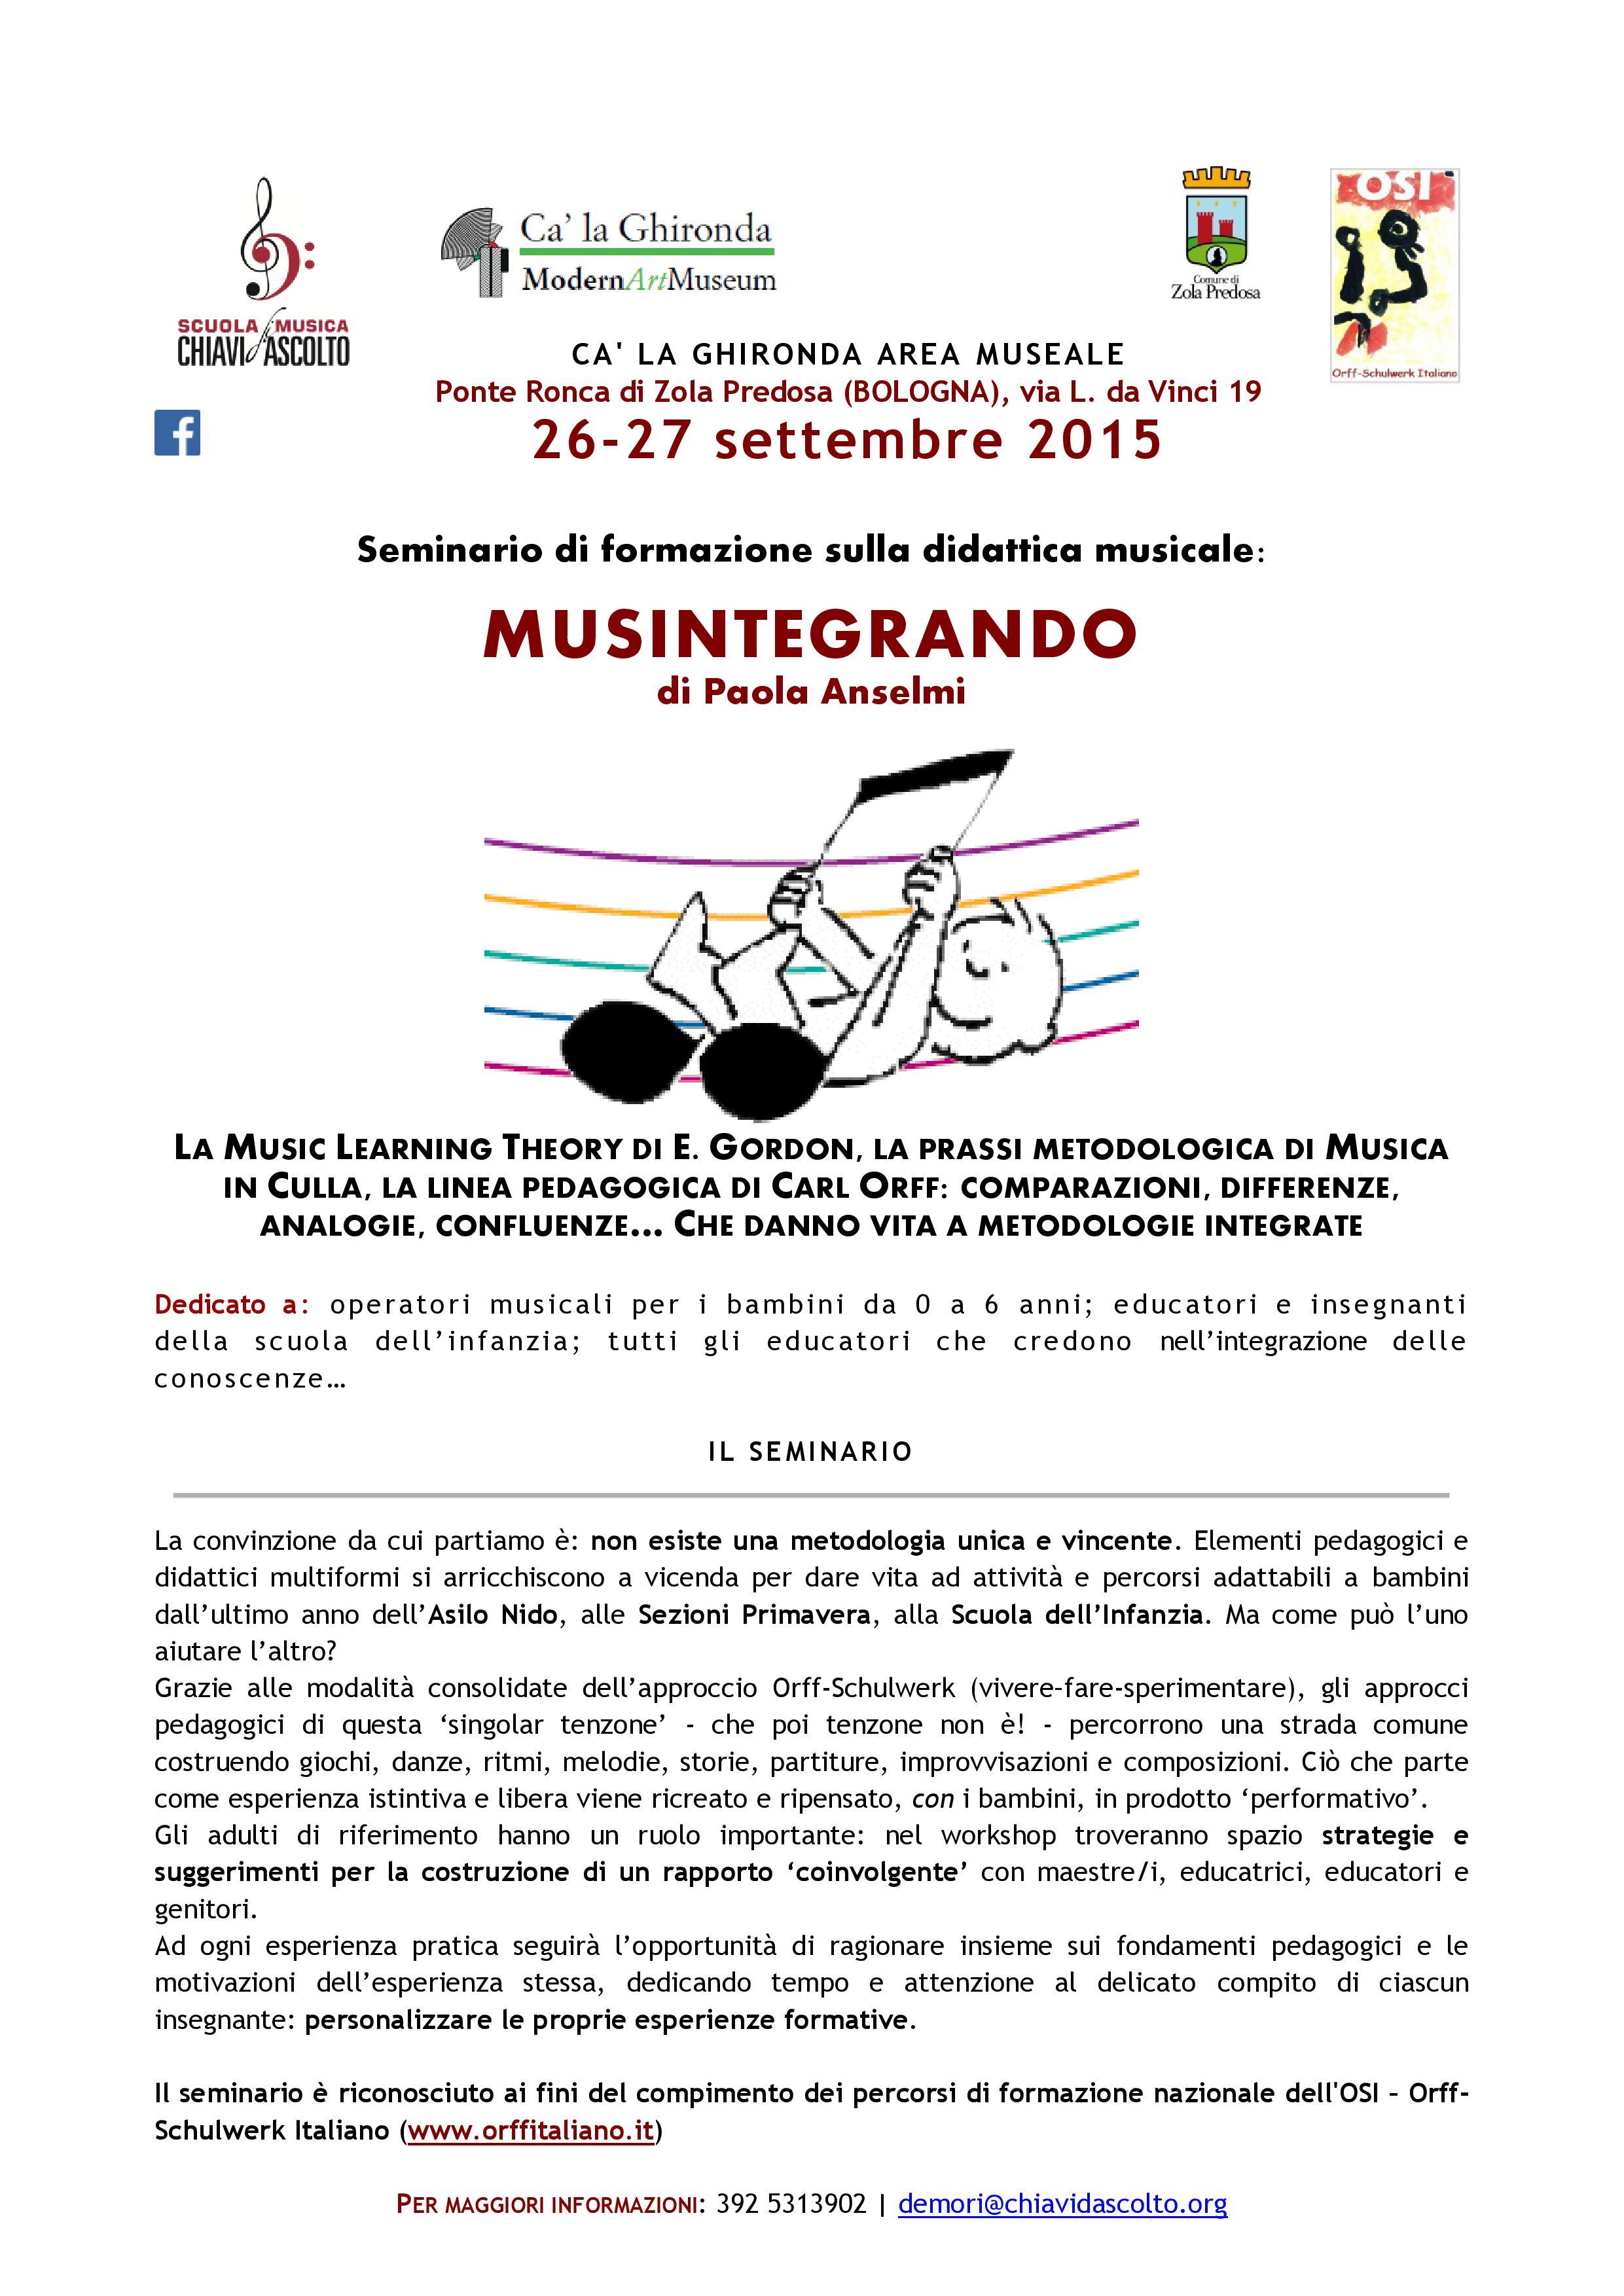 Volantino_MUSINTEGRANDO_Bologna_26-27sett2015-page-001